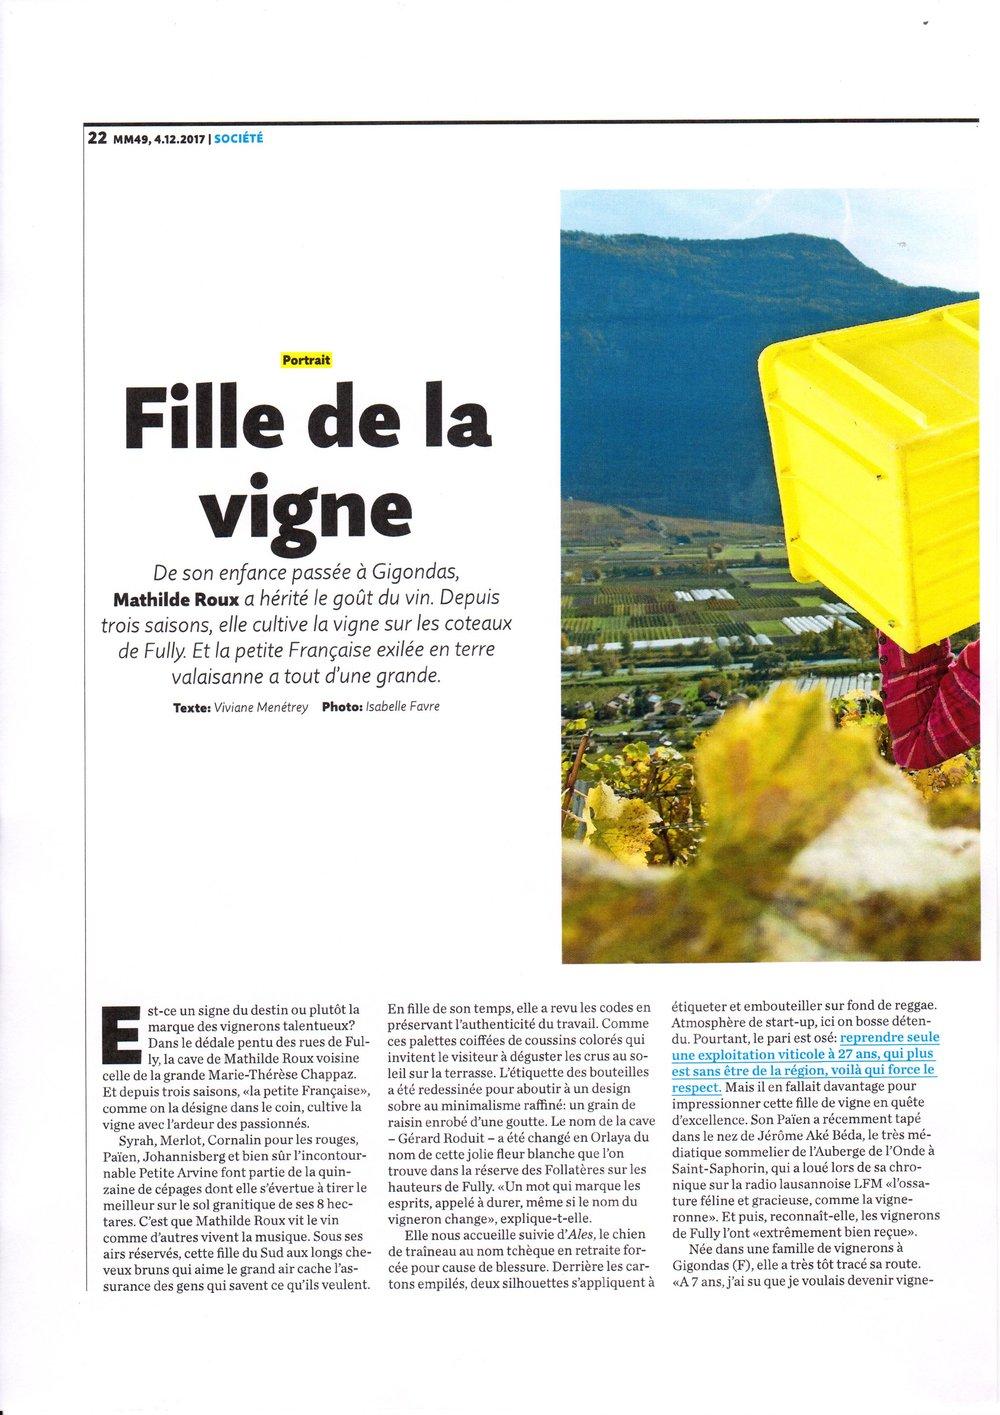 migros magazine 4.12.2017 (1).jpeg